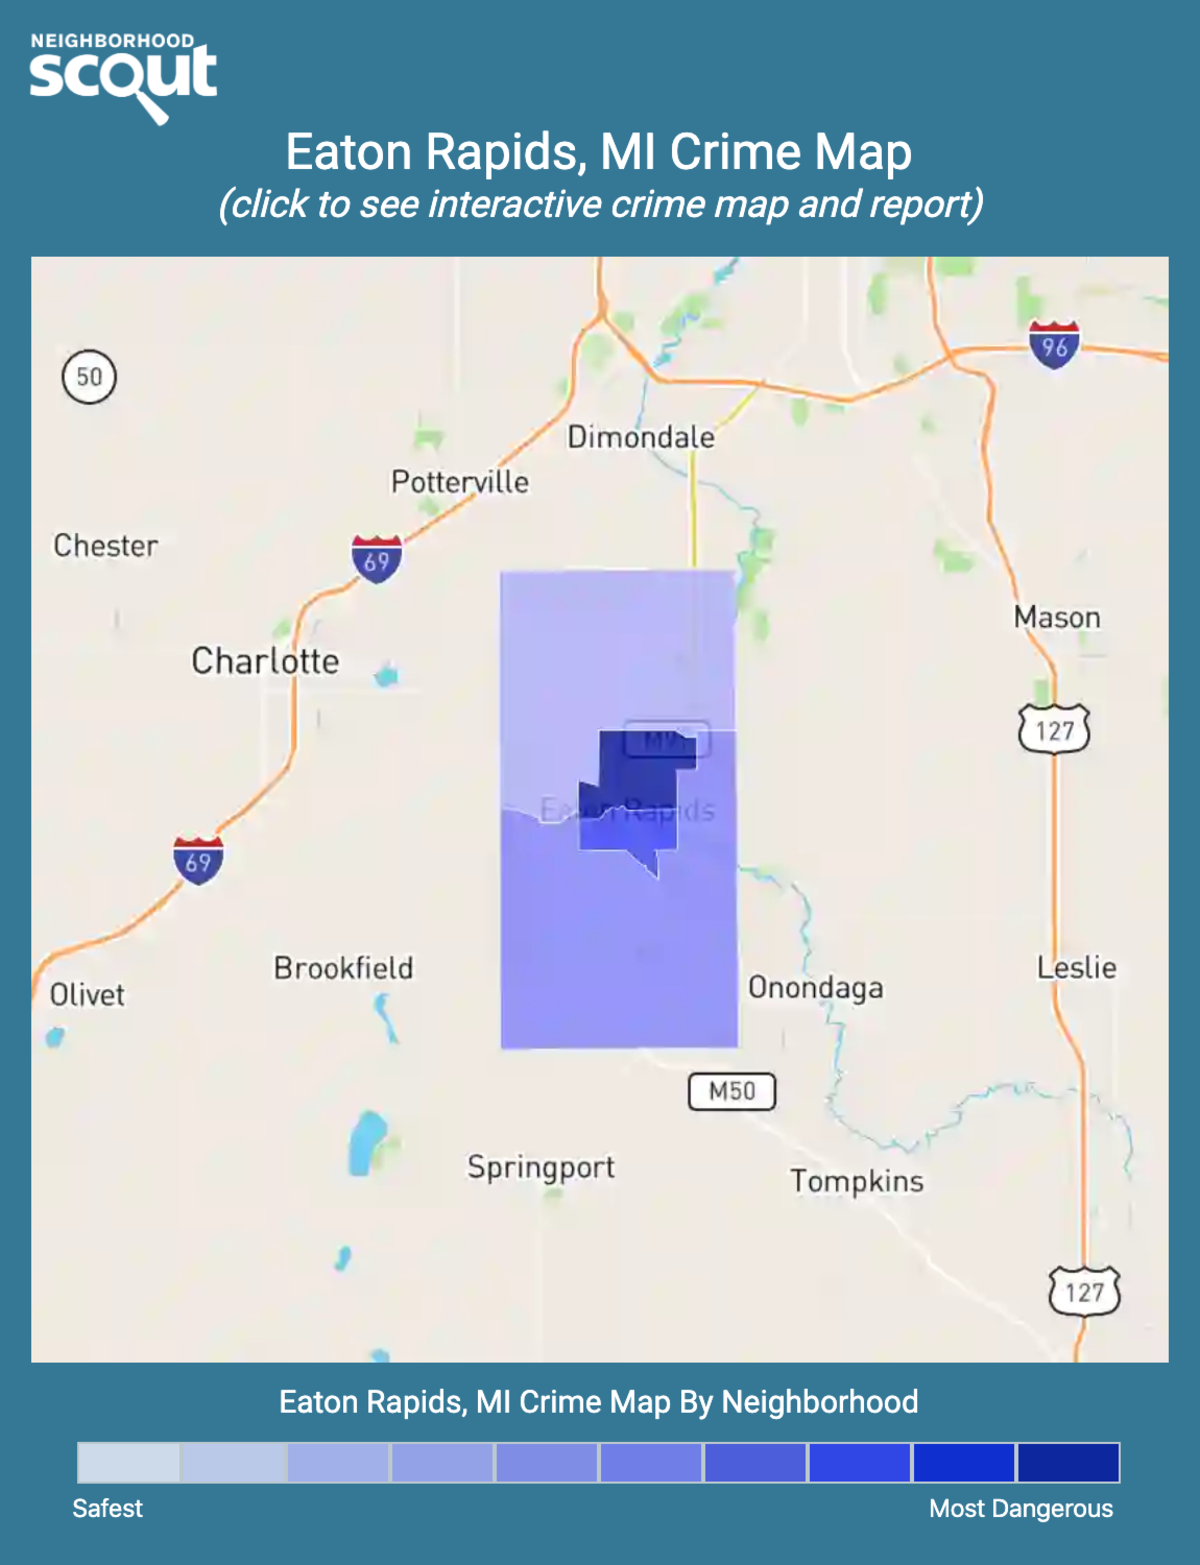 Eaton Rapids, Michigan crime map